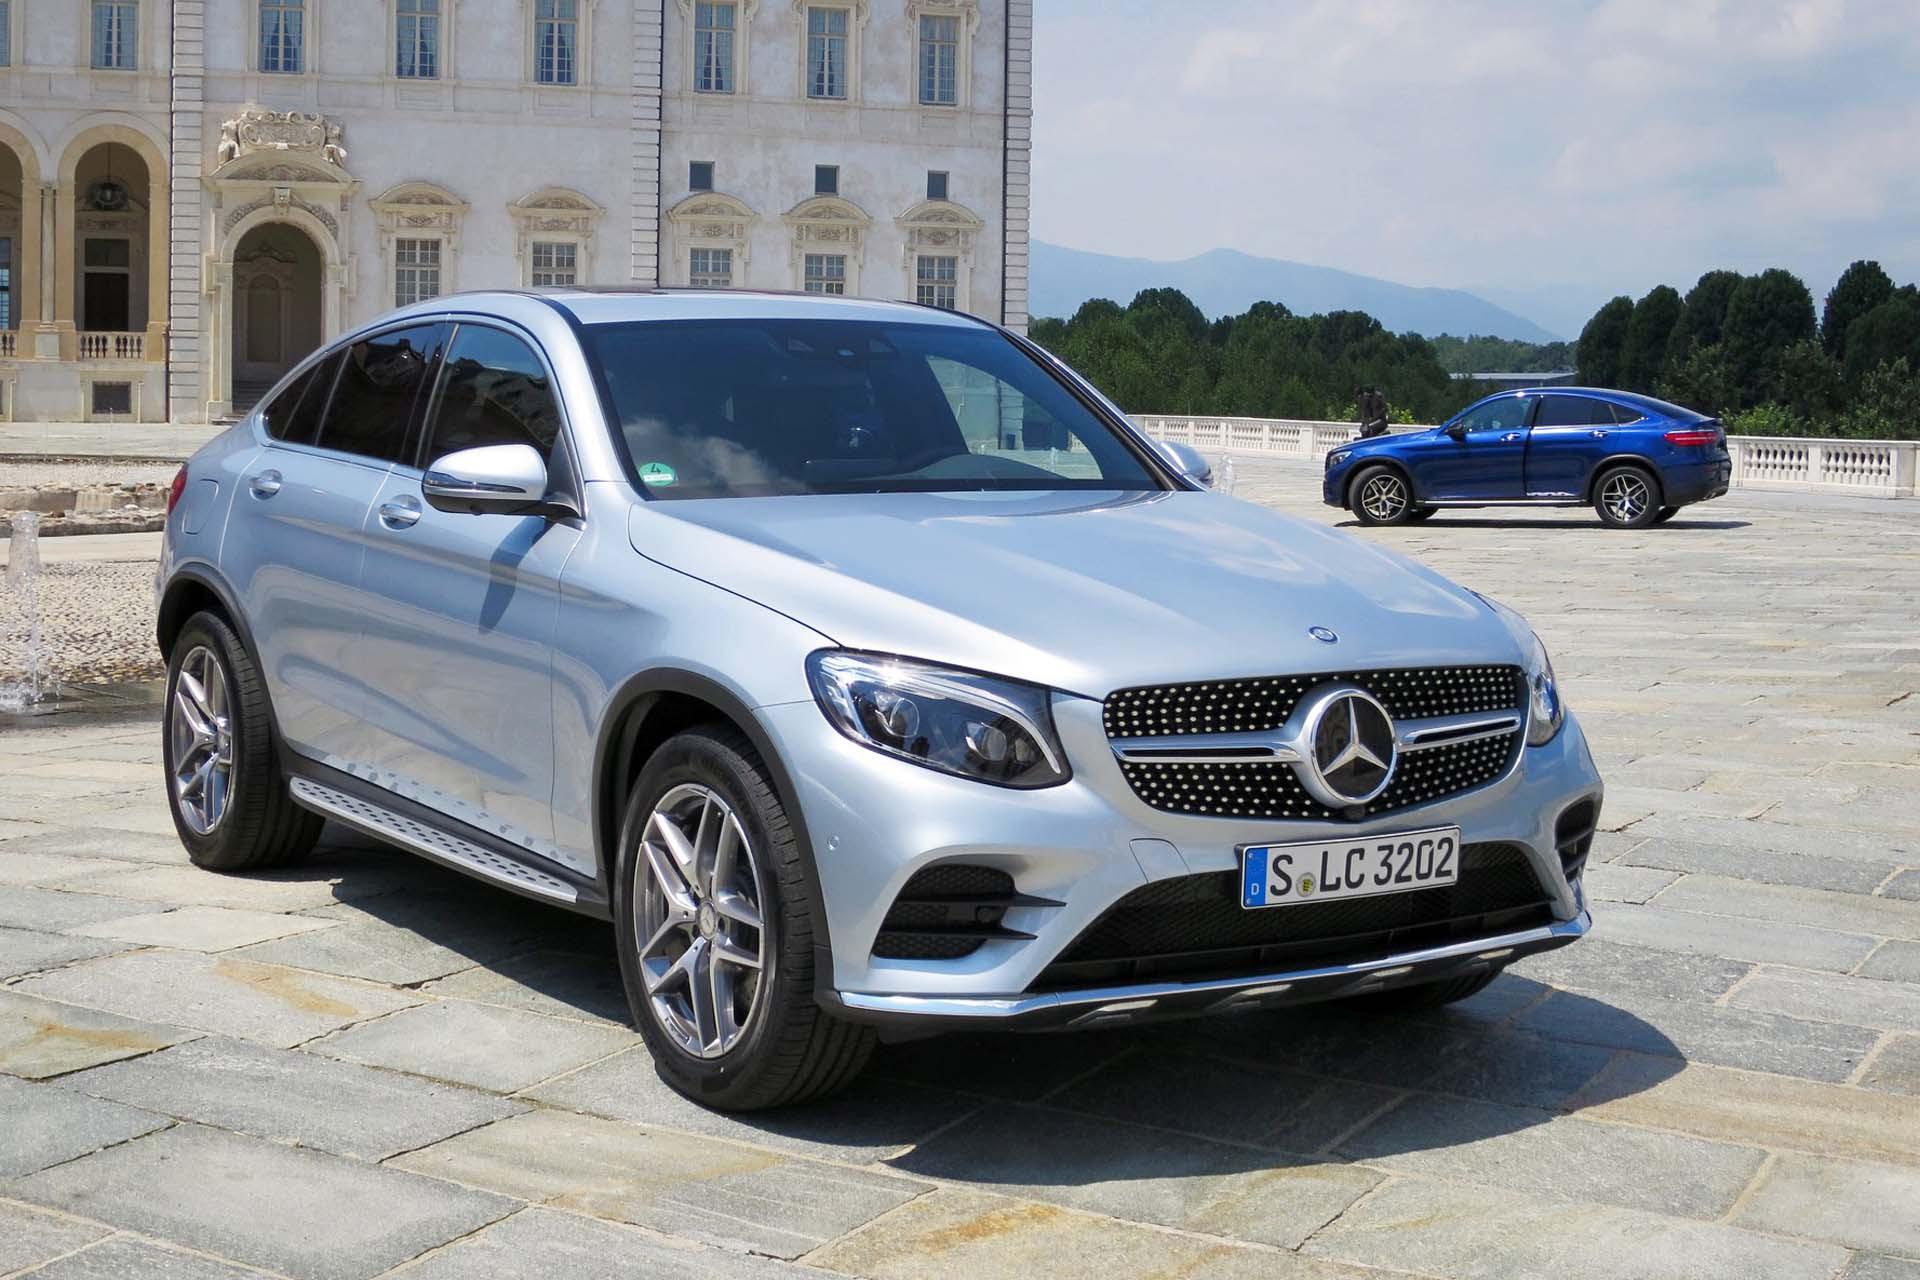 2017 Mercedes-Benz GLC 300 4MATIC Coupe - Autos.ca